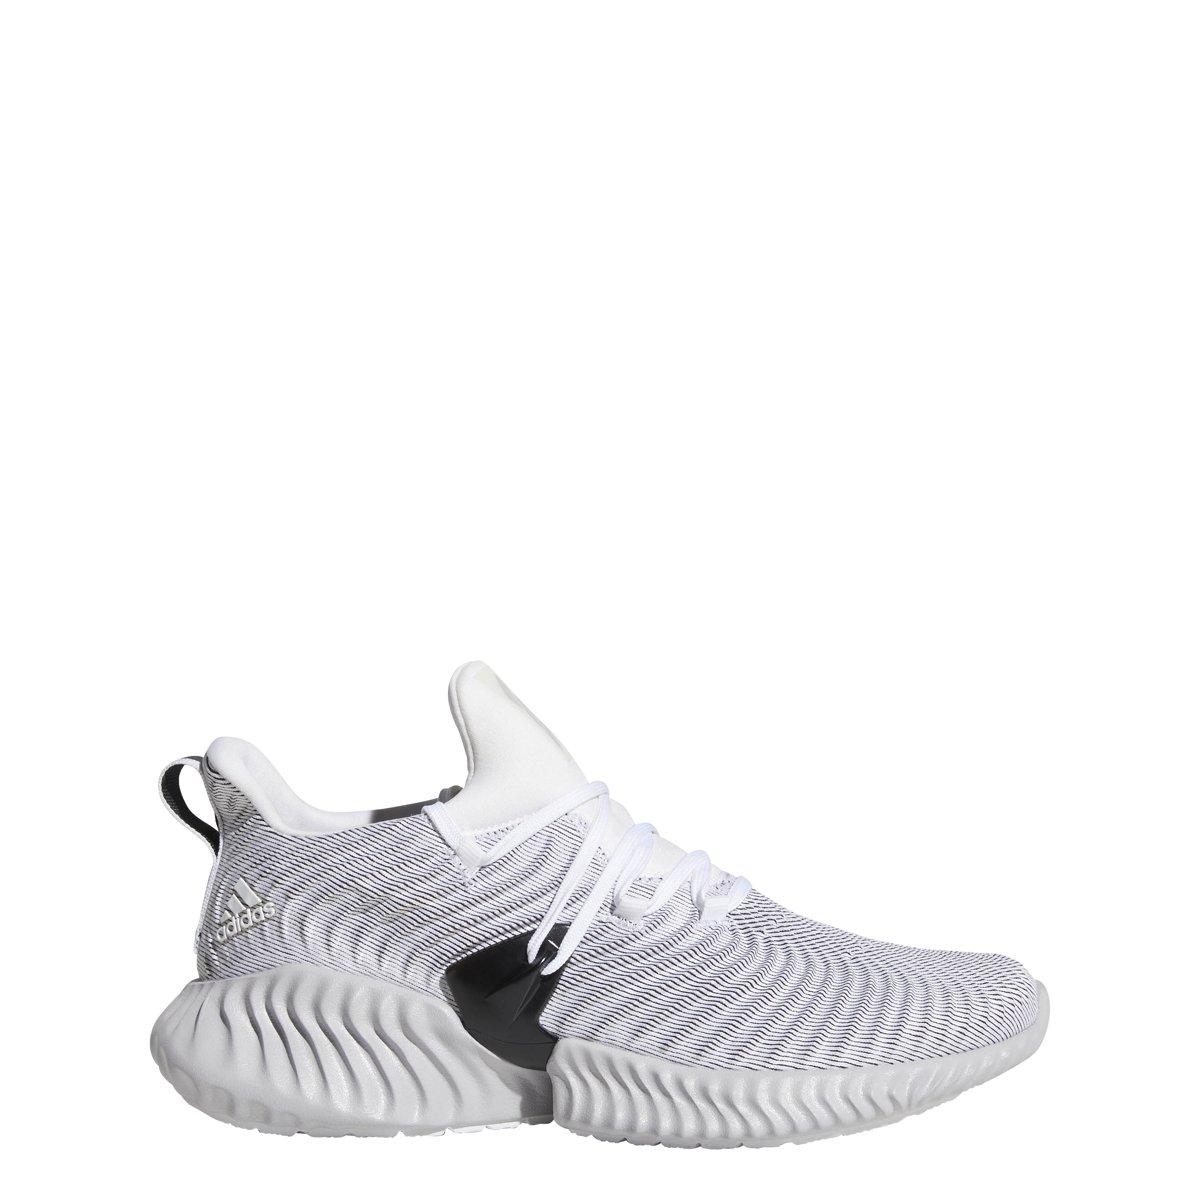 White-Grey-Black adidas Alphabounce Instinct shoes Women's Running